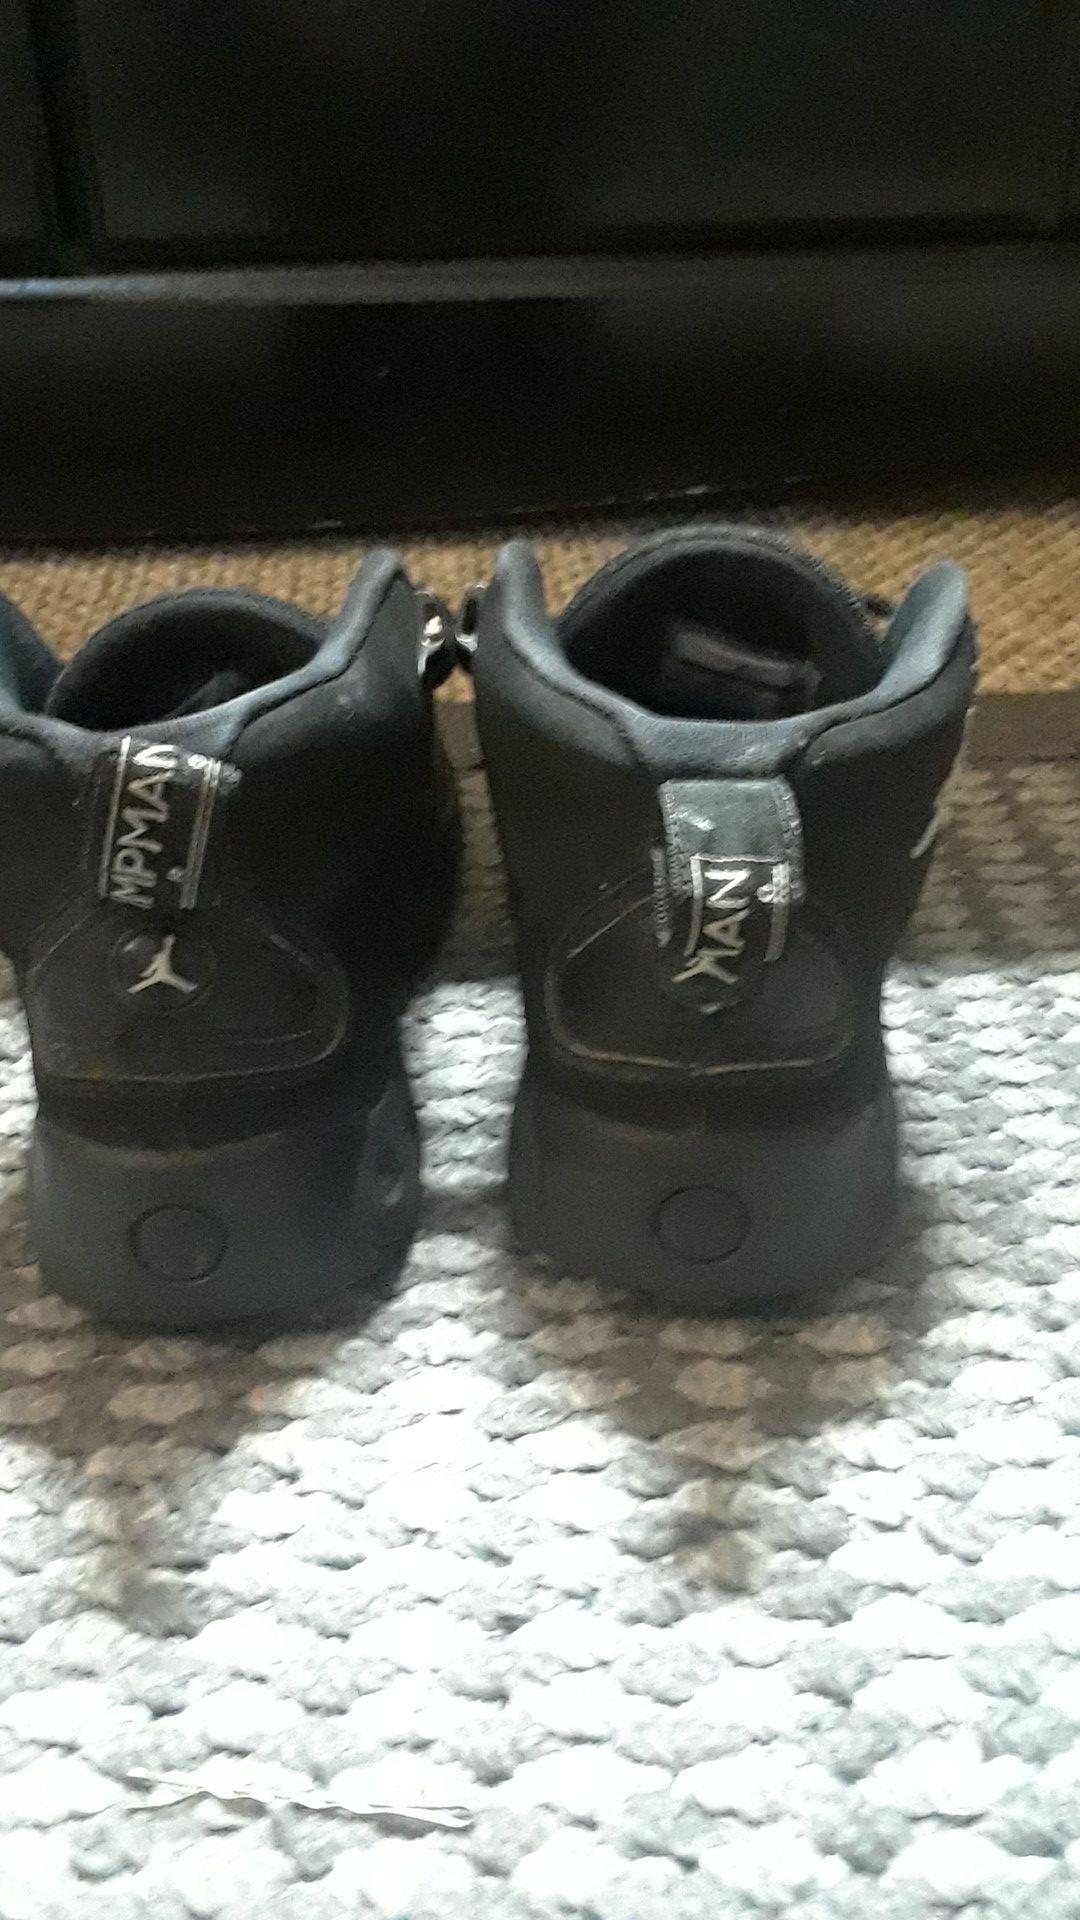 Nike Jordan Jumpman Pro Youth size 4